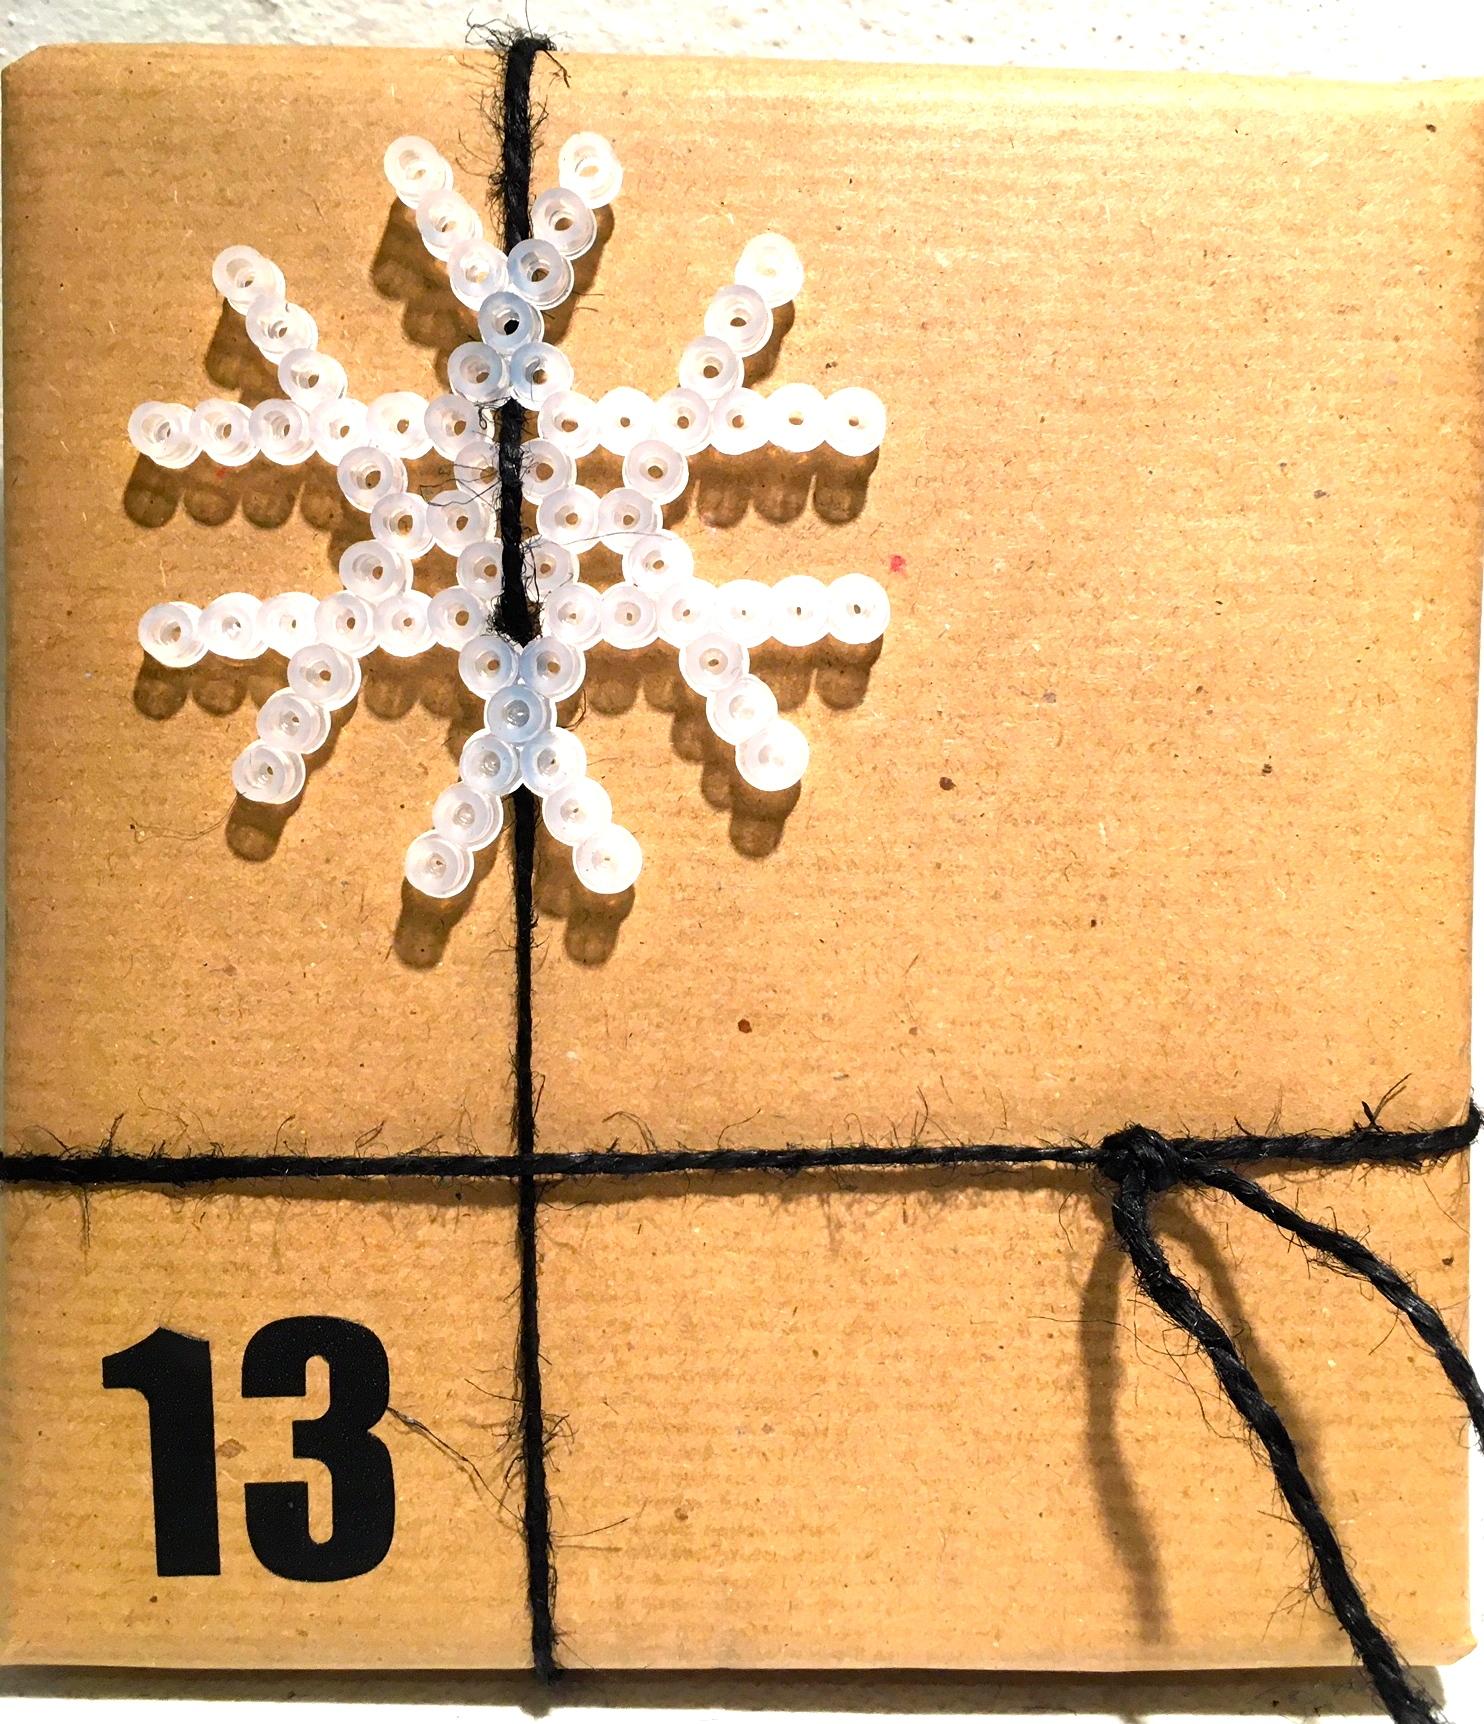 Juletræspakkekalendergave nr. 13